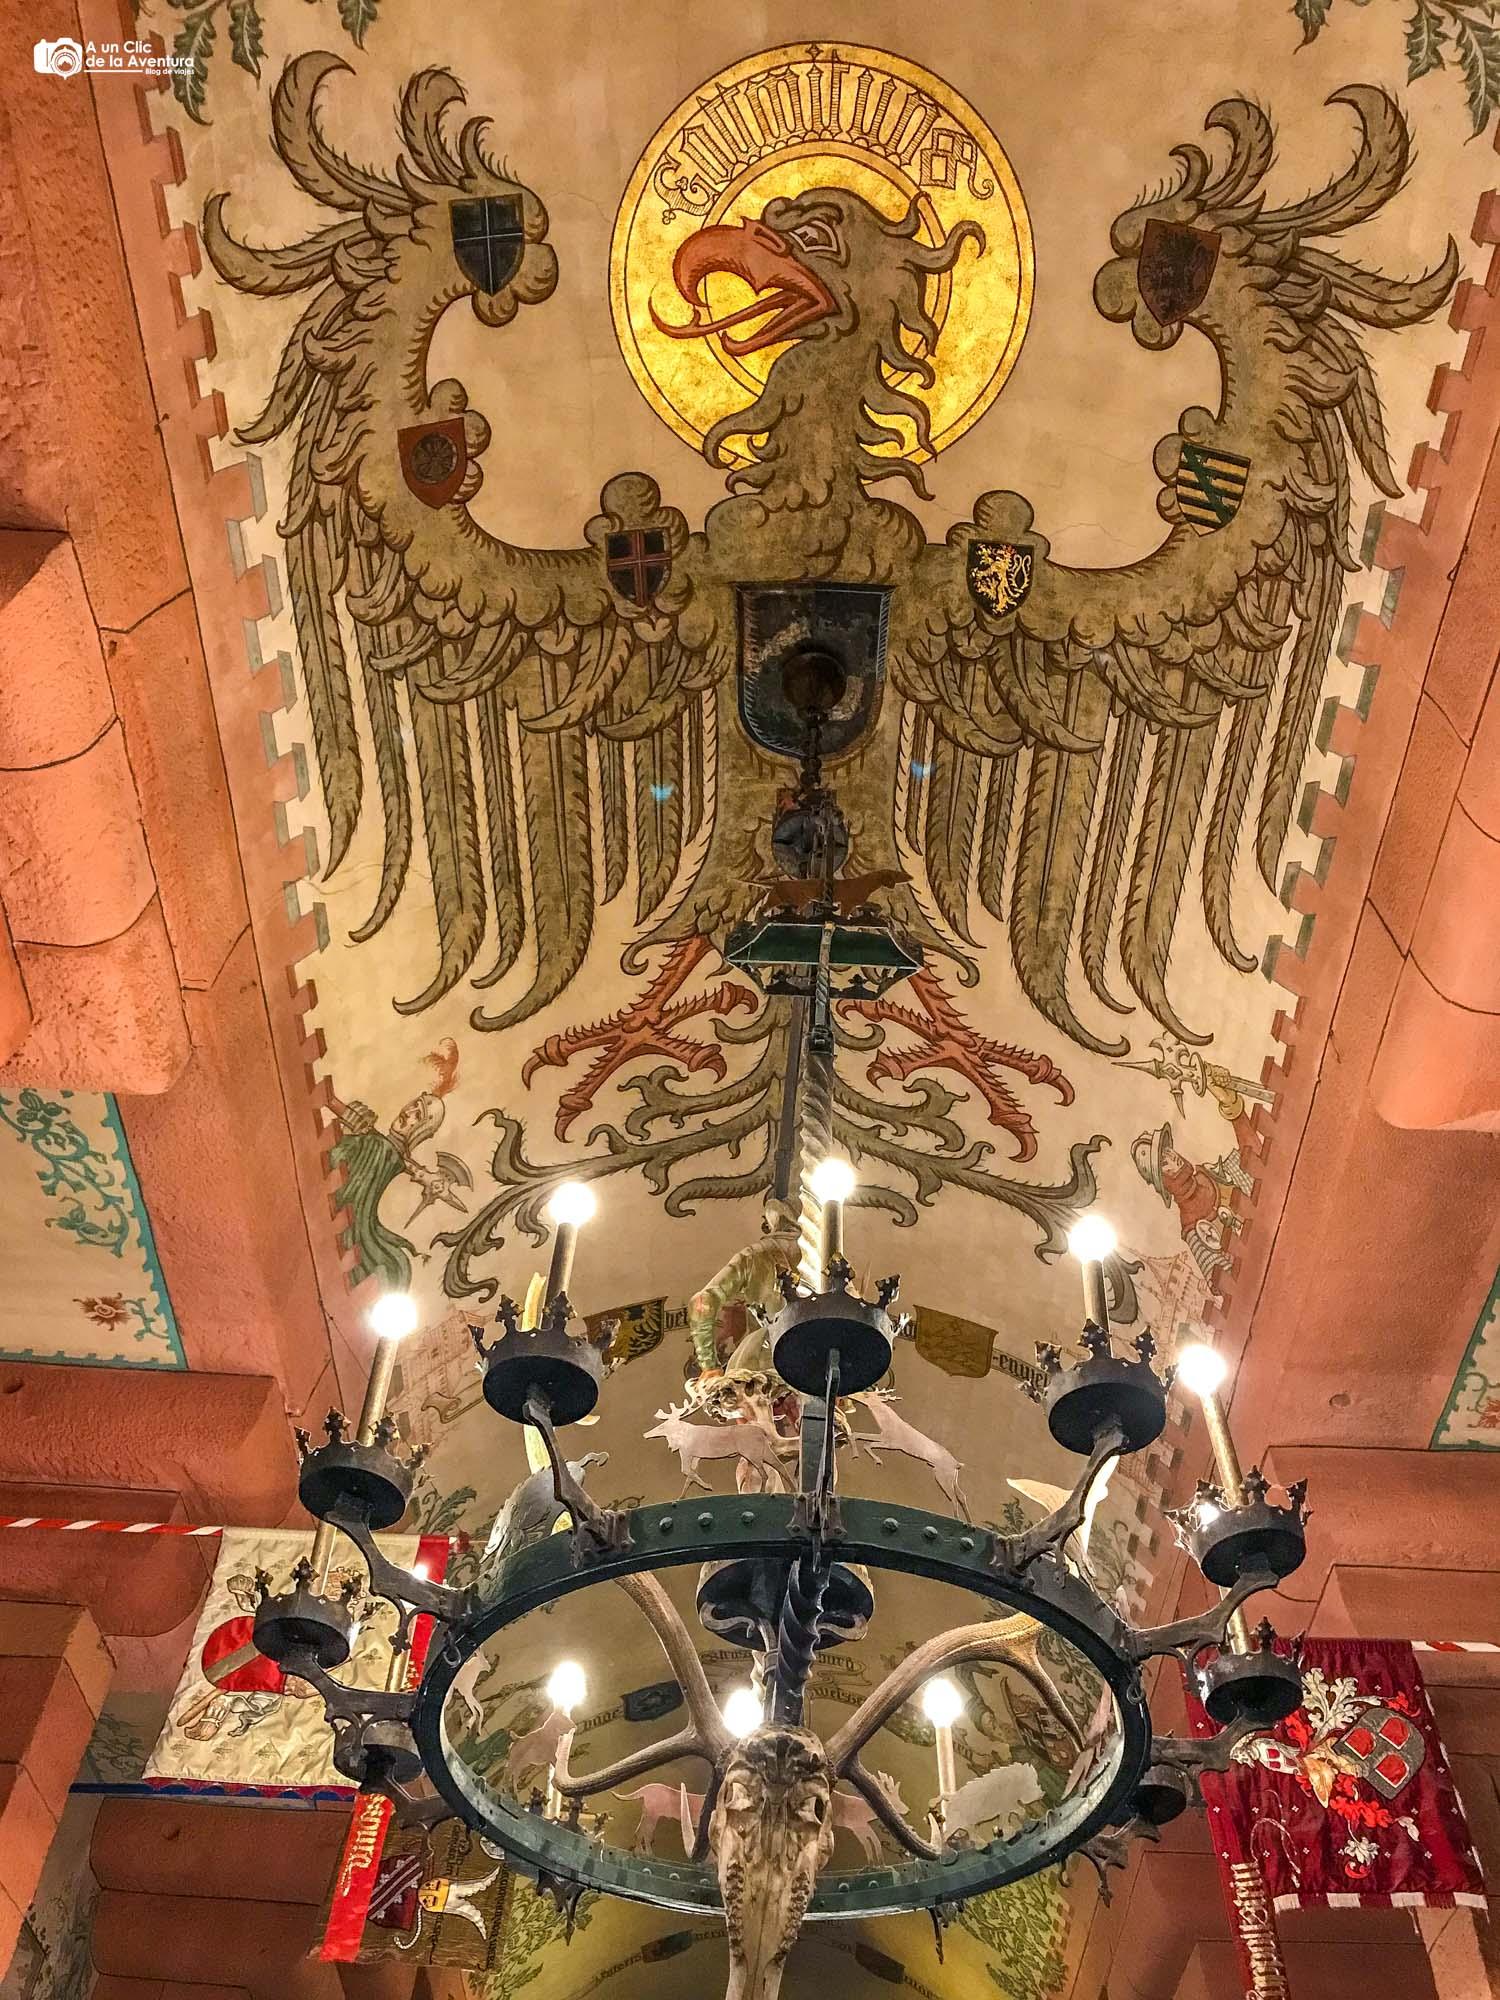 Águila del Salón del Káiser del Castillo de Haut-Koenigsbourg